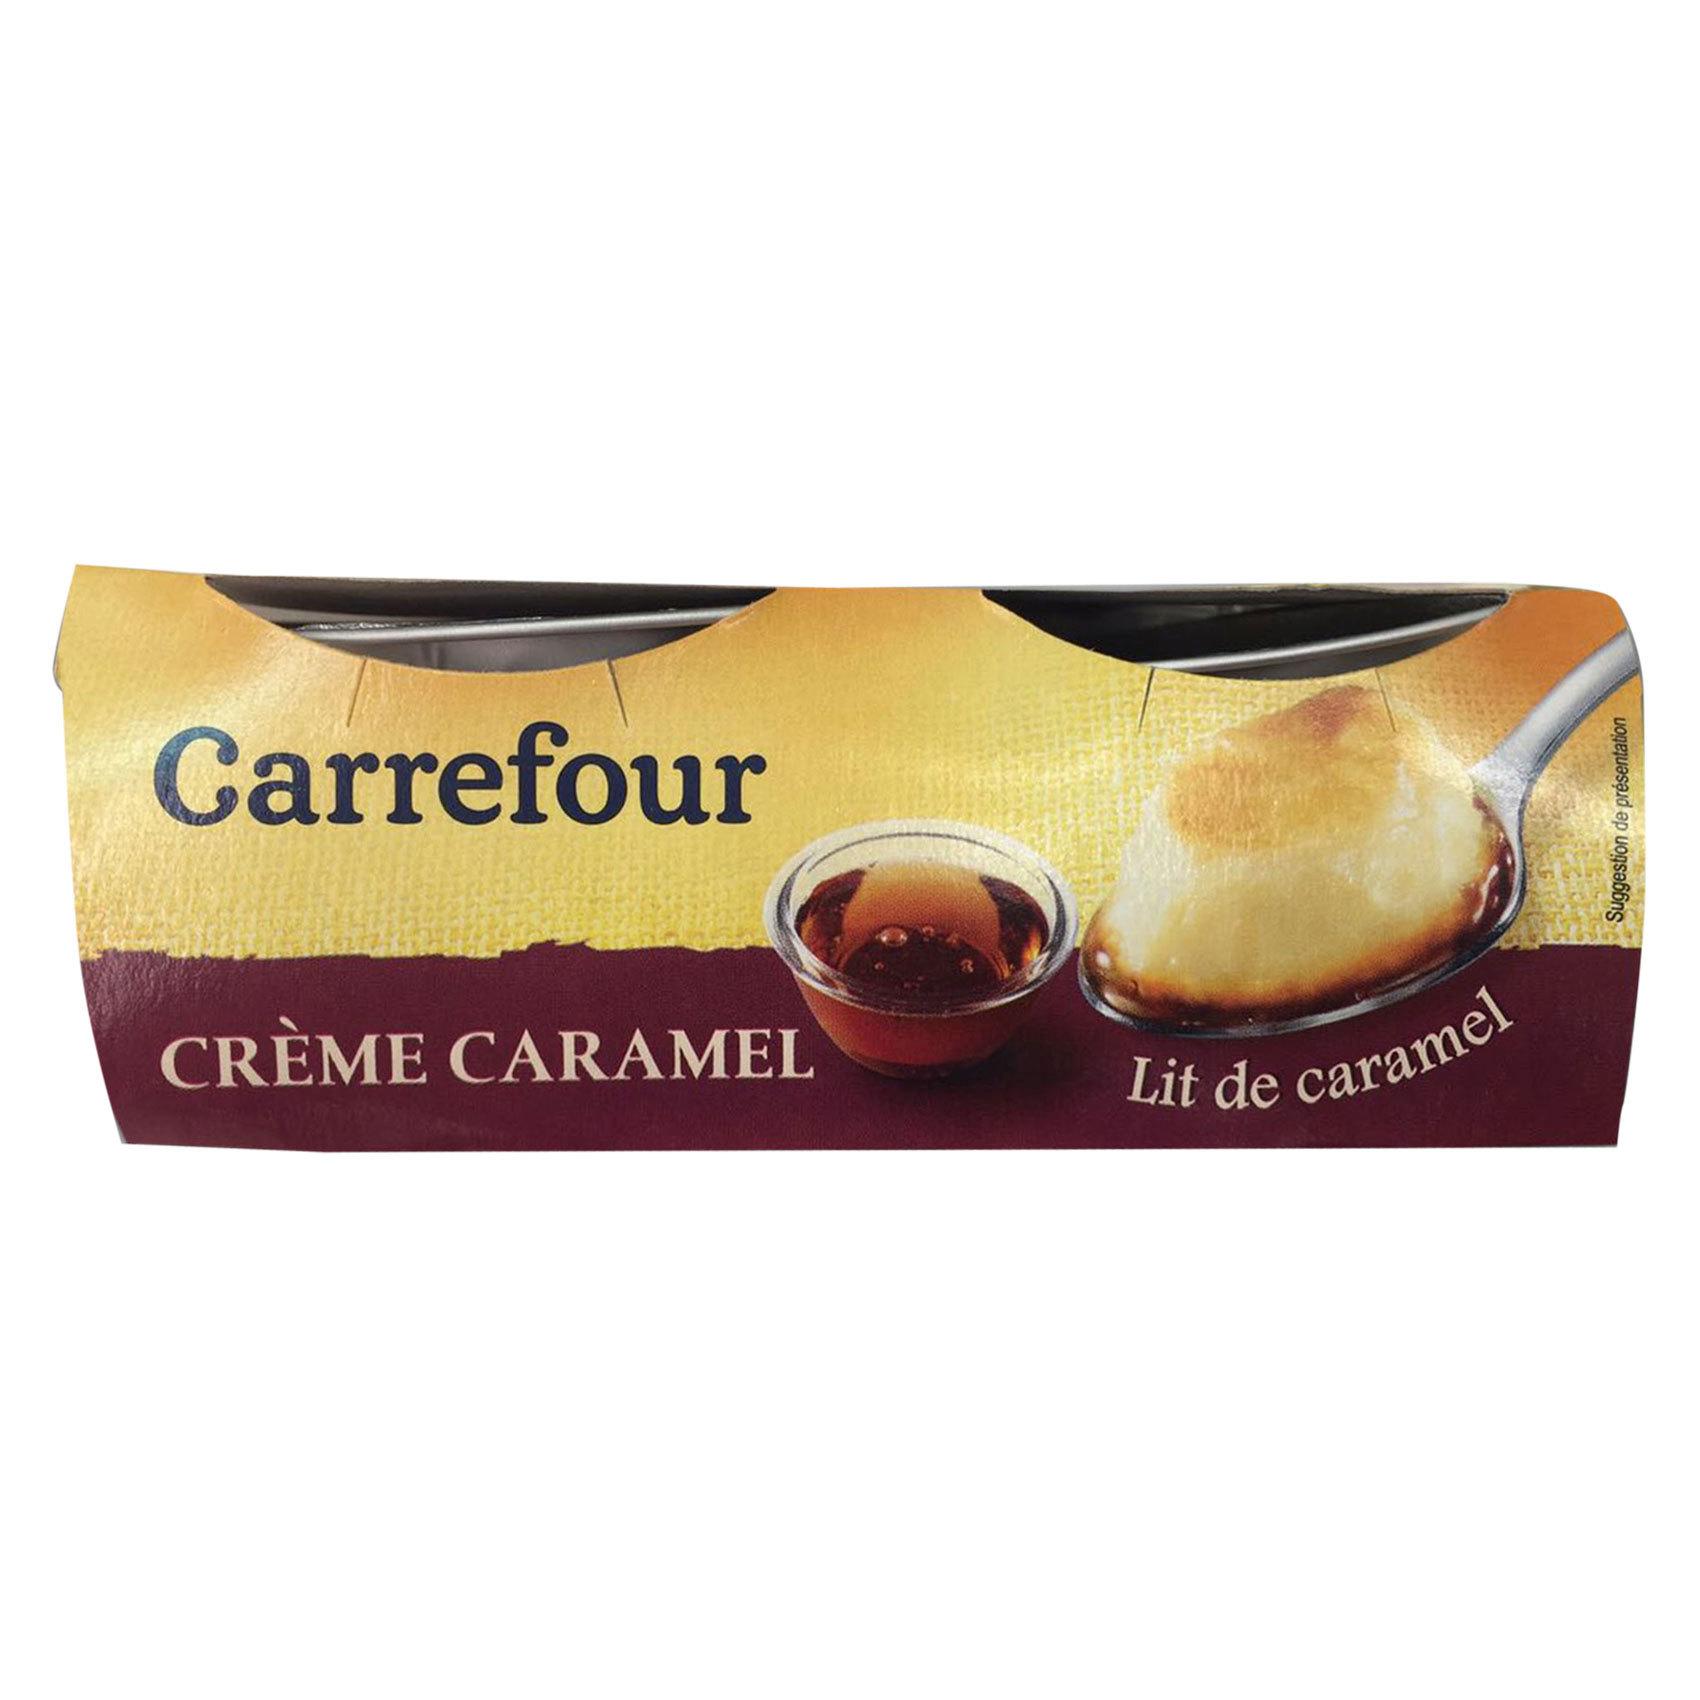 CRF CREME CARAMEL 100GRX4